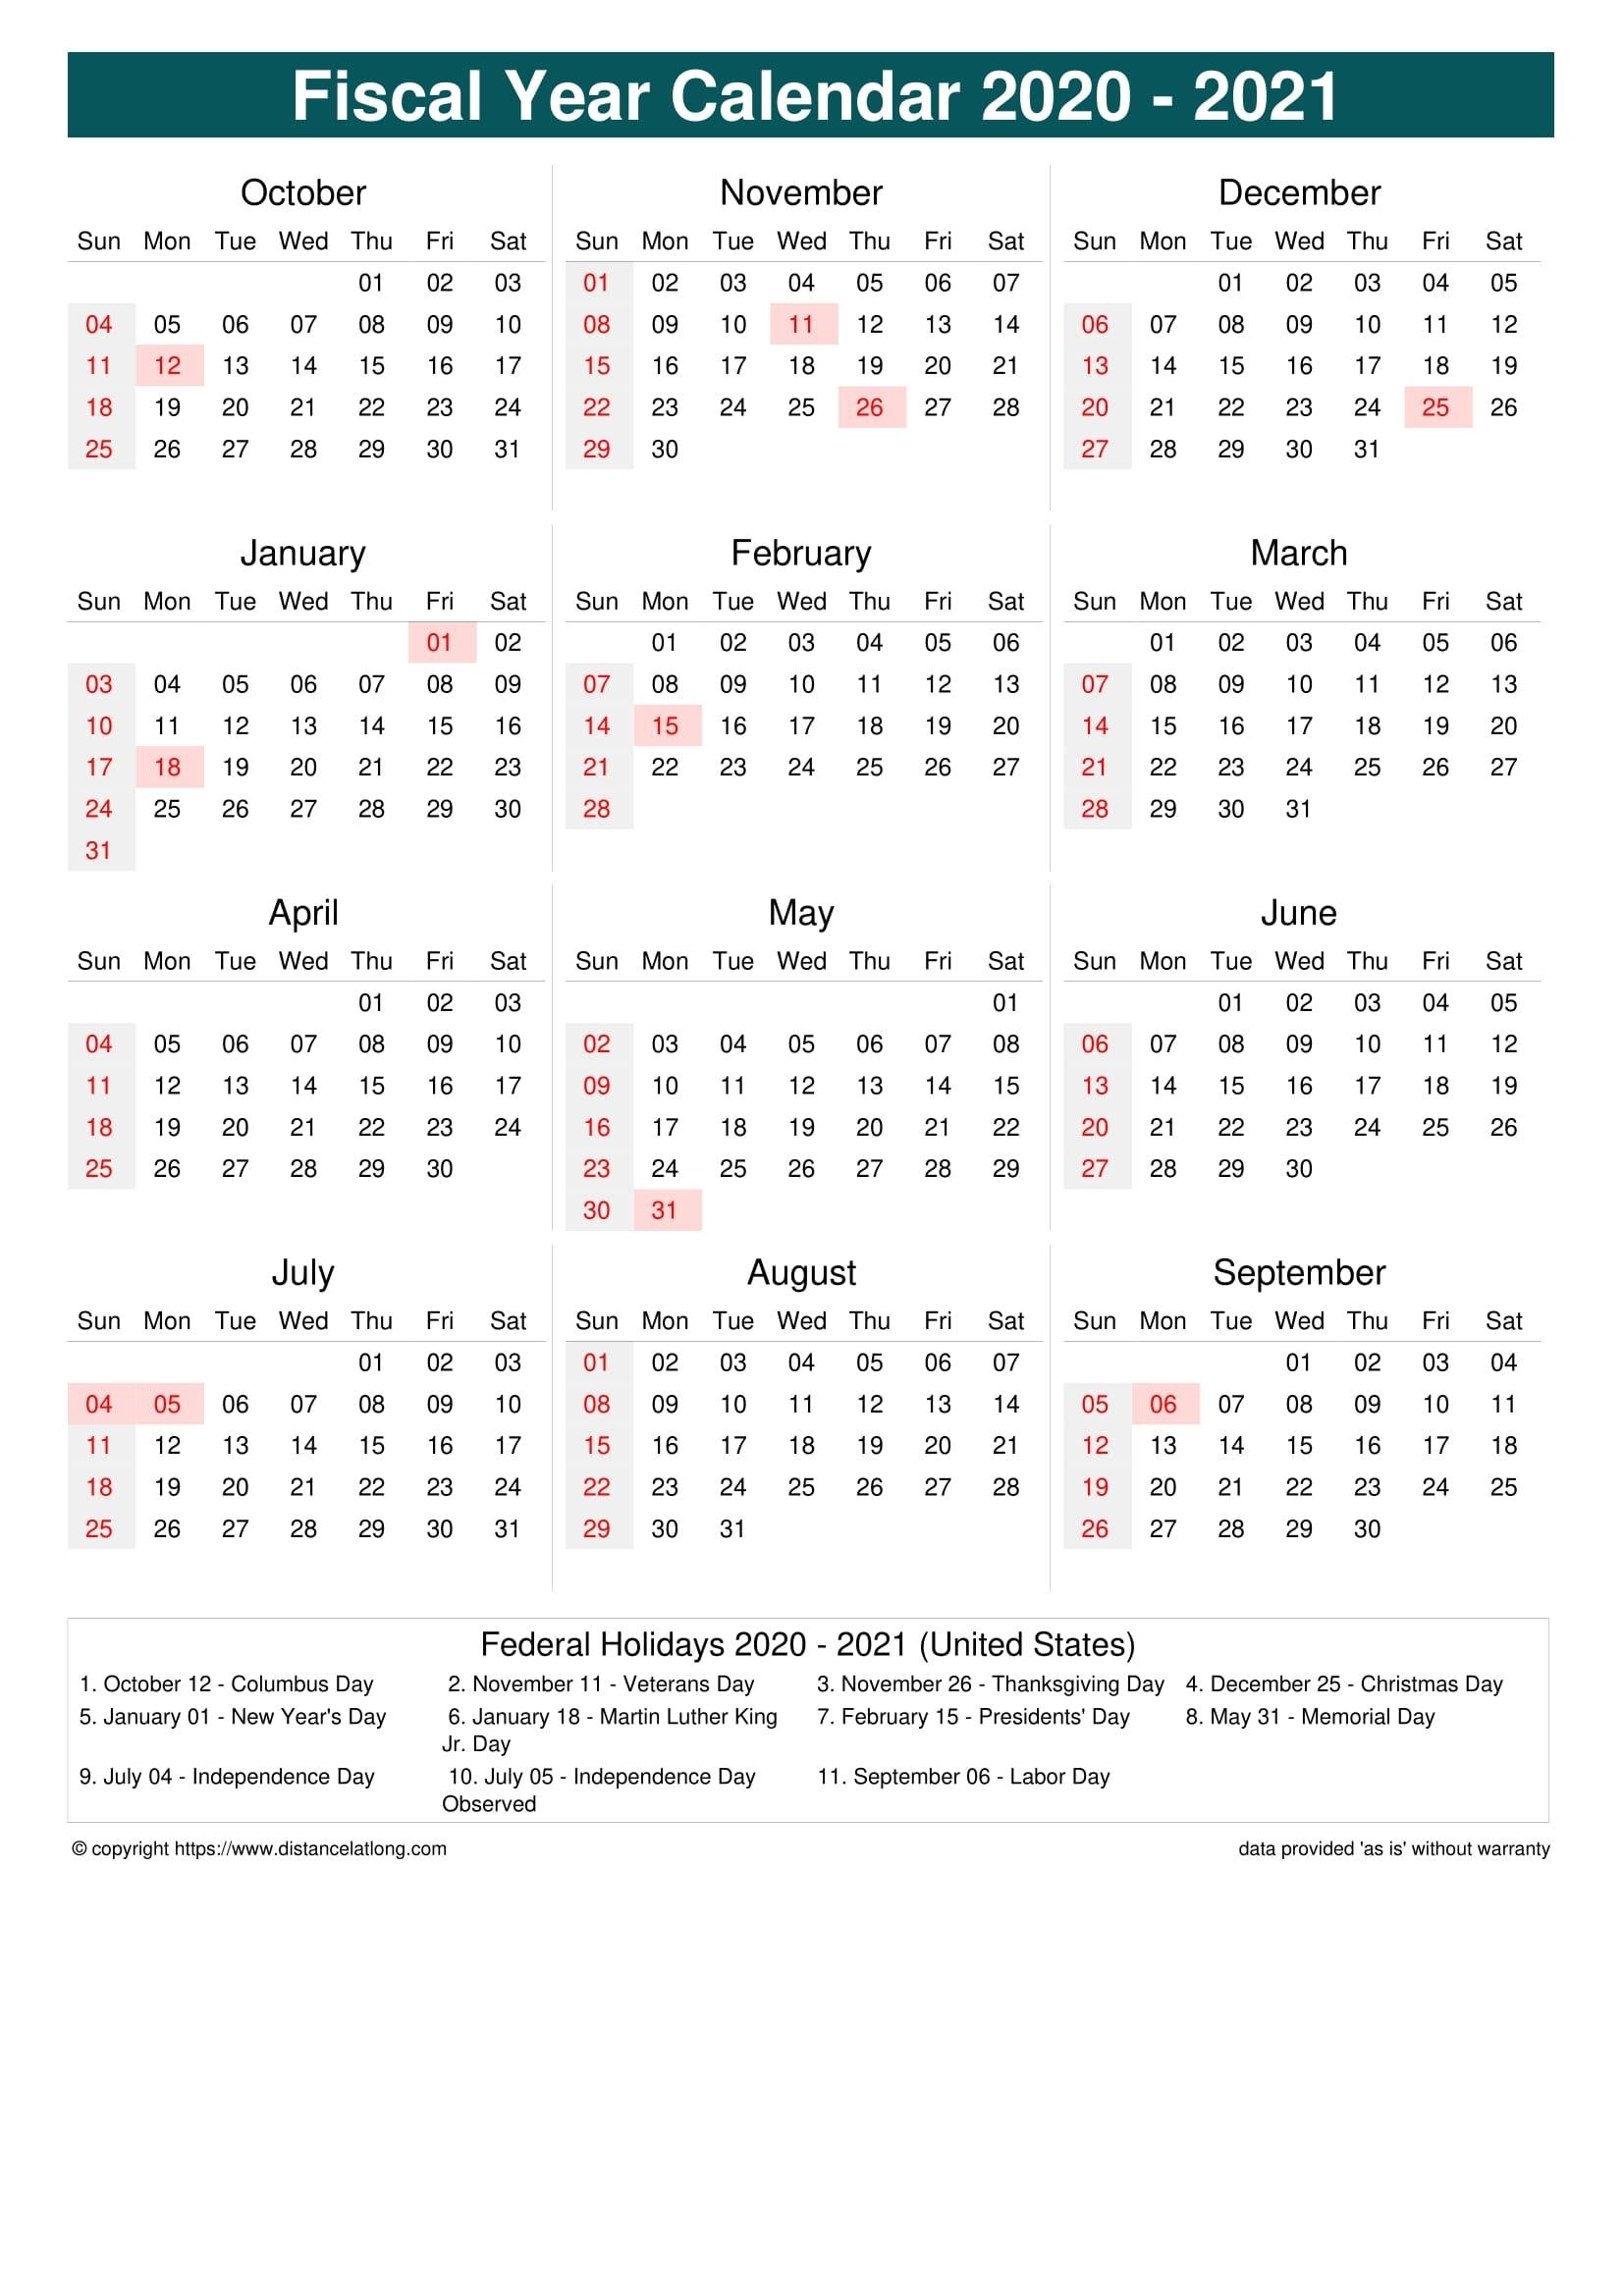 Take Week 29 Fiscal Calendar 2021 What Dates